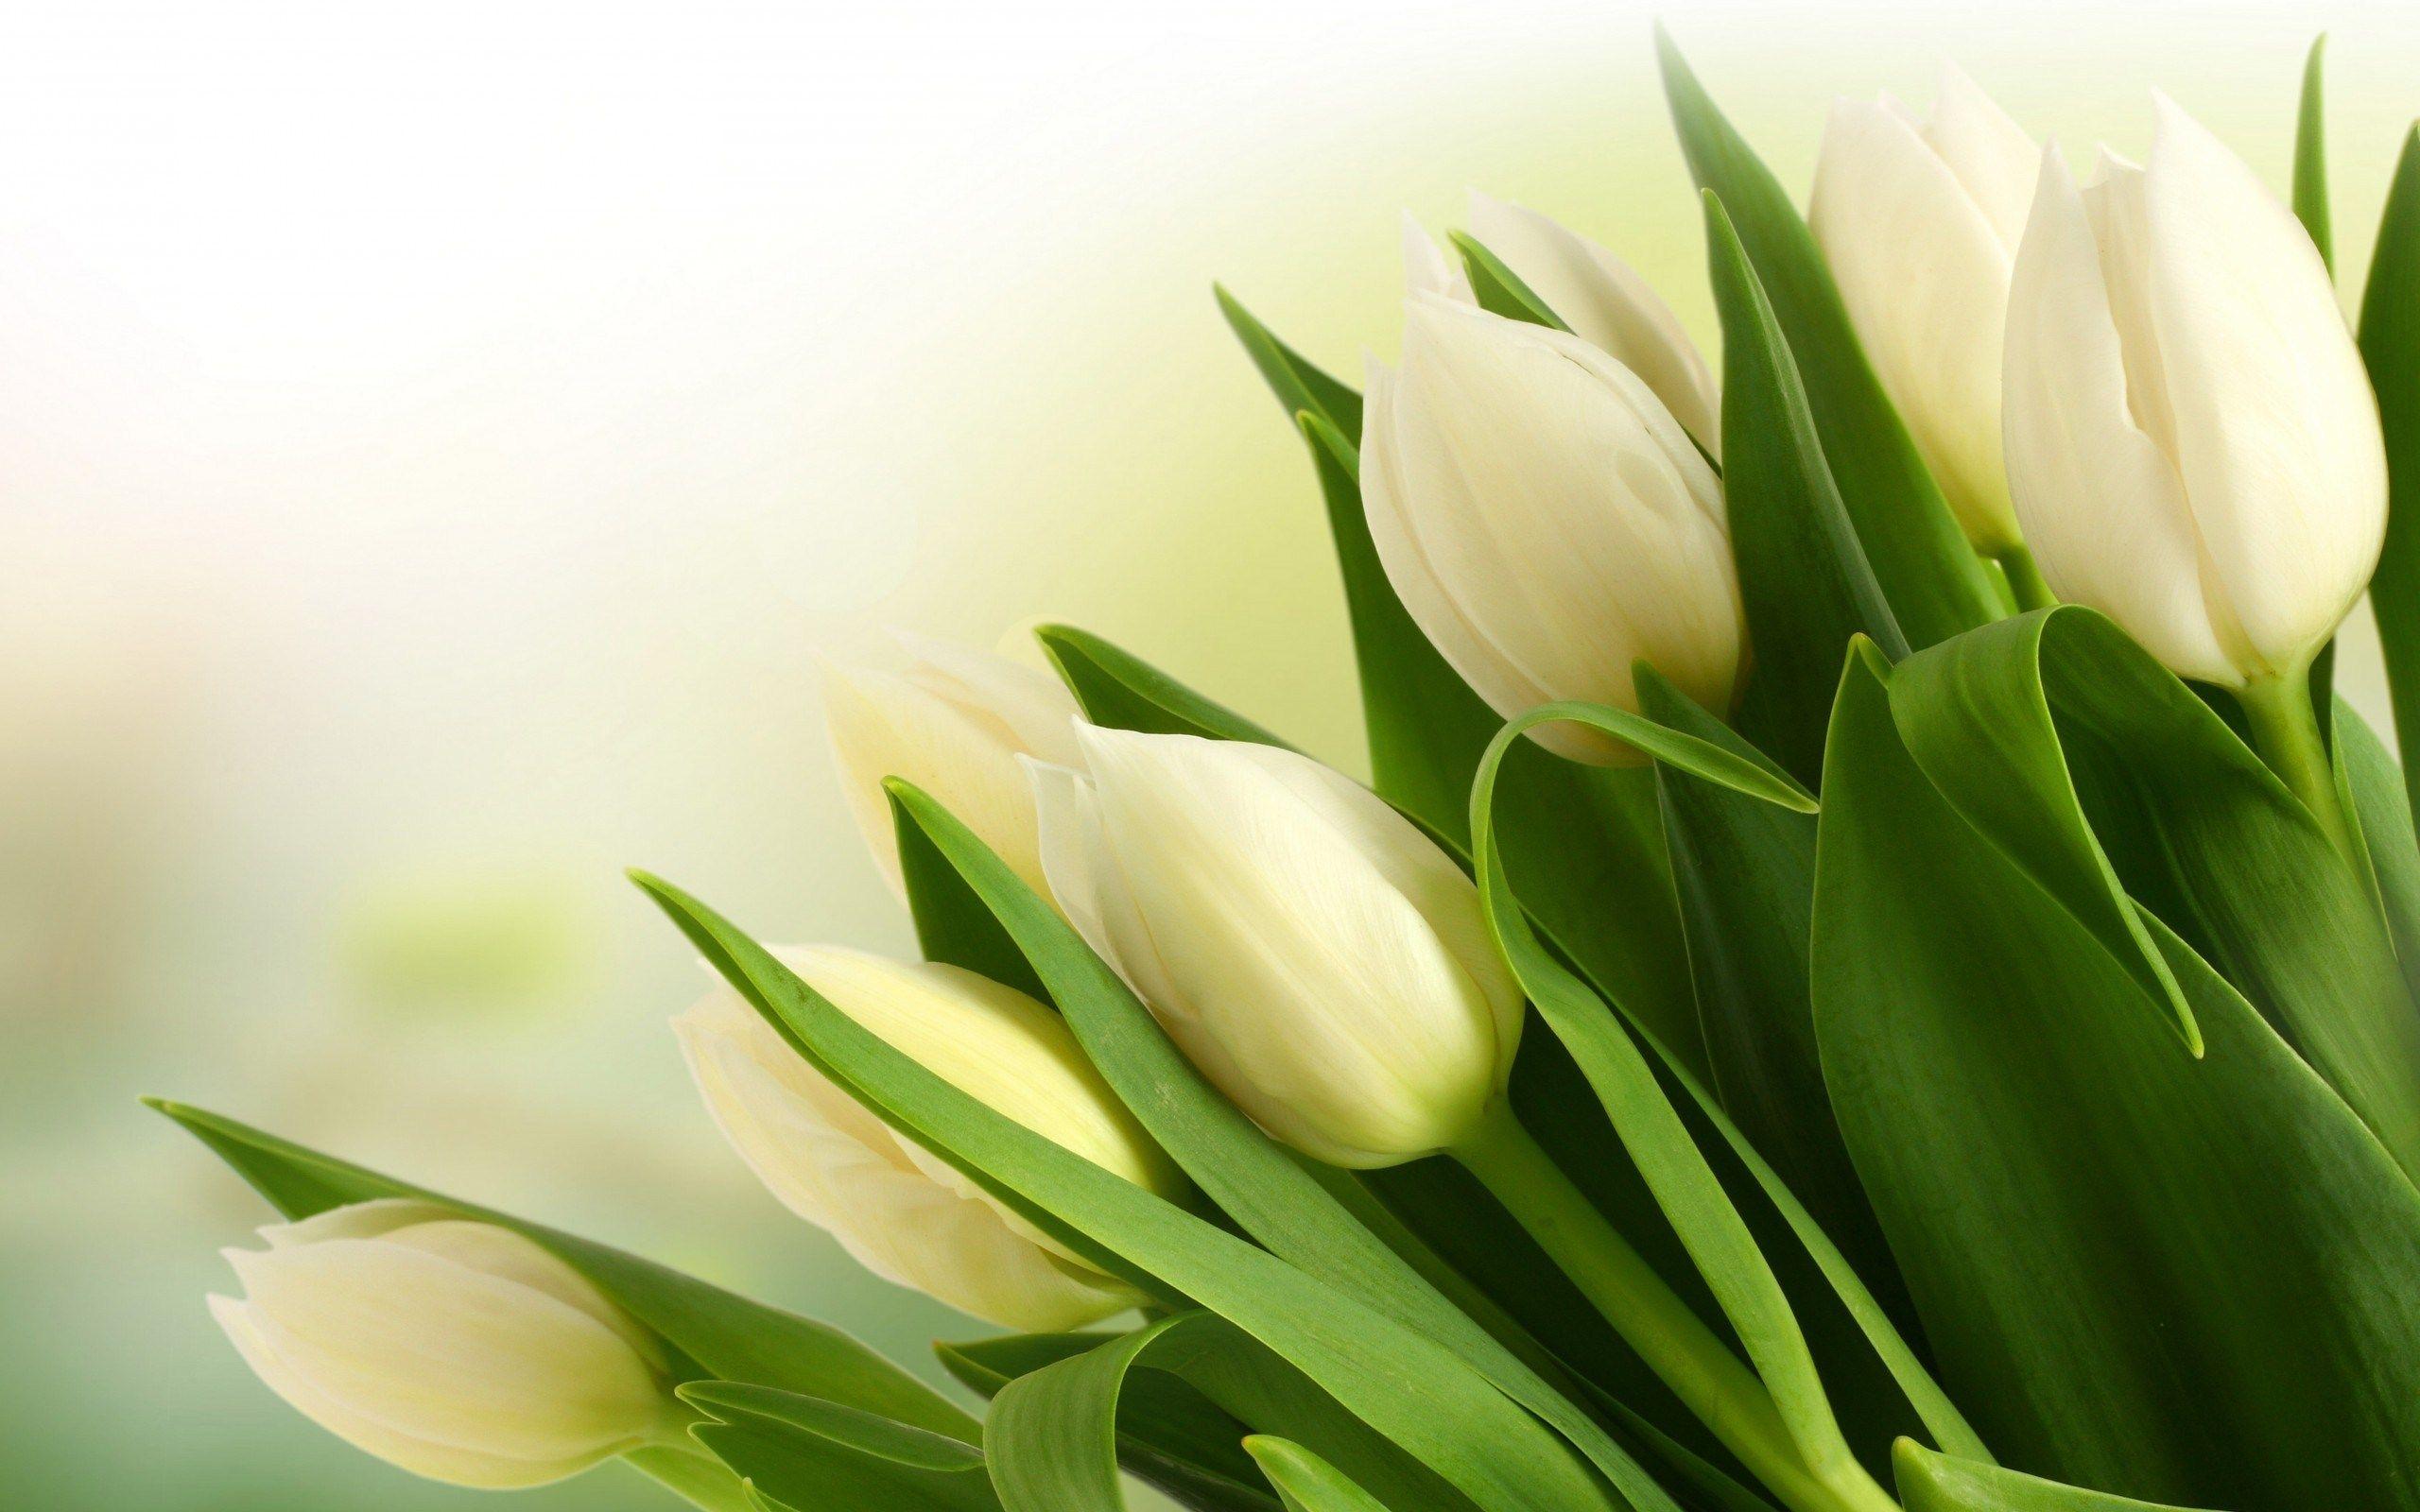 White Tulips Wallpaper Tulips Flowers Tulips White Tulips